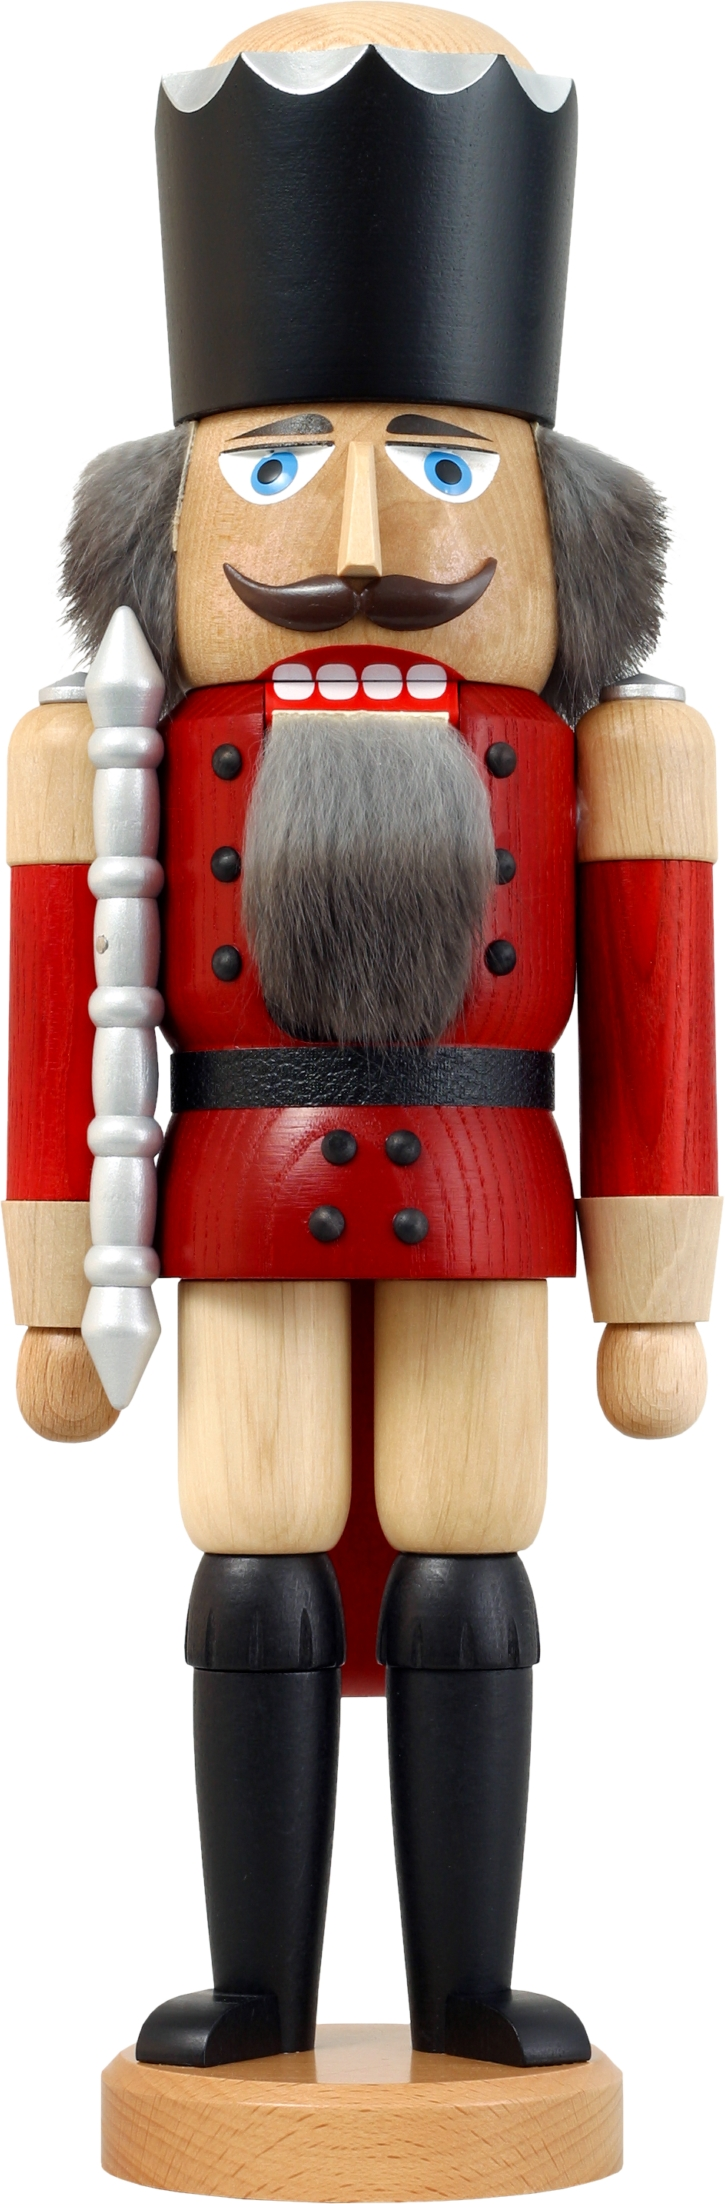 Nussknacker König aus Esche lasiert rot